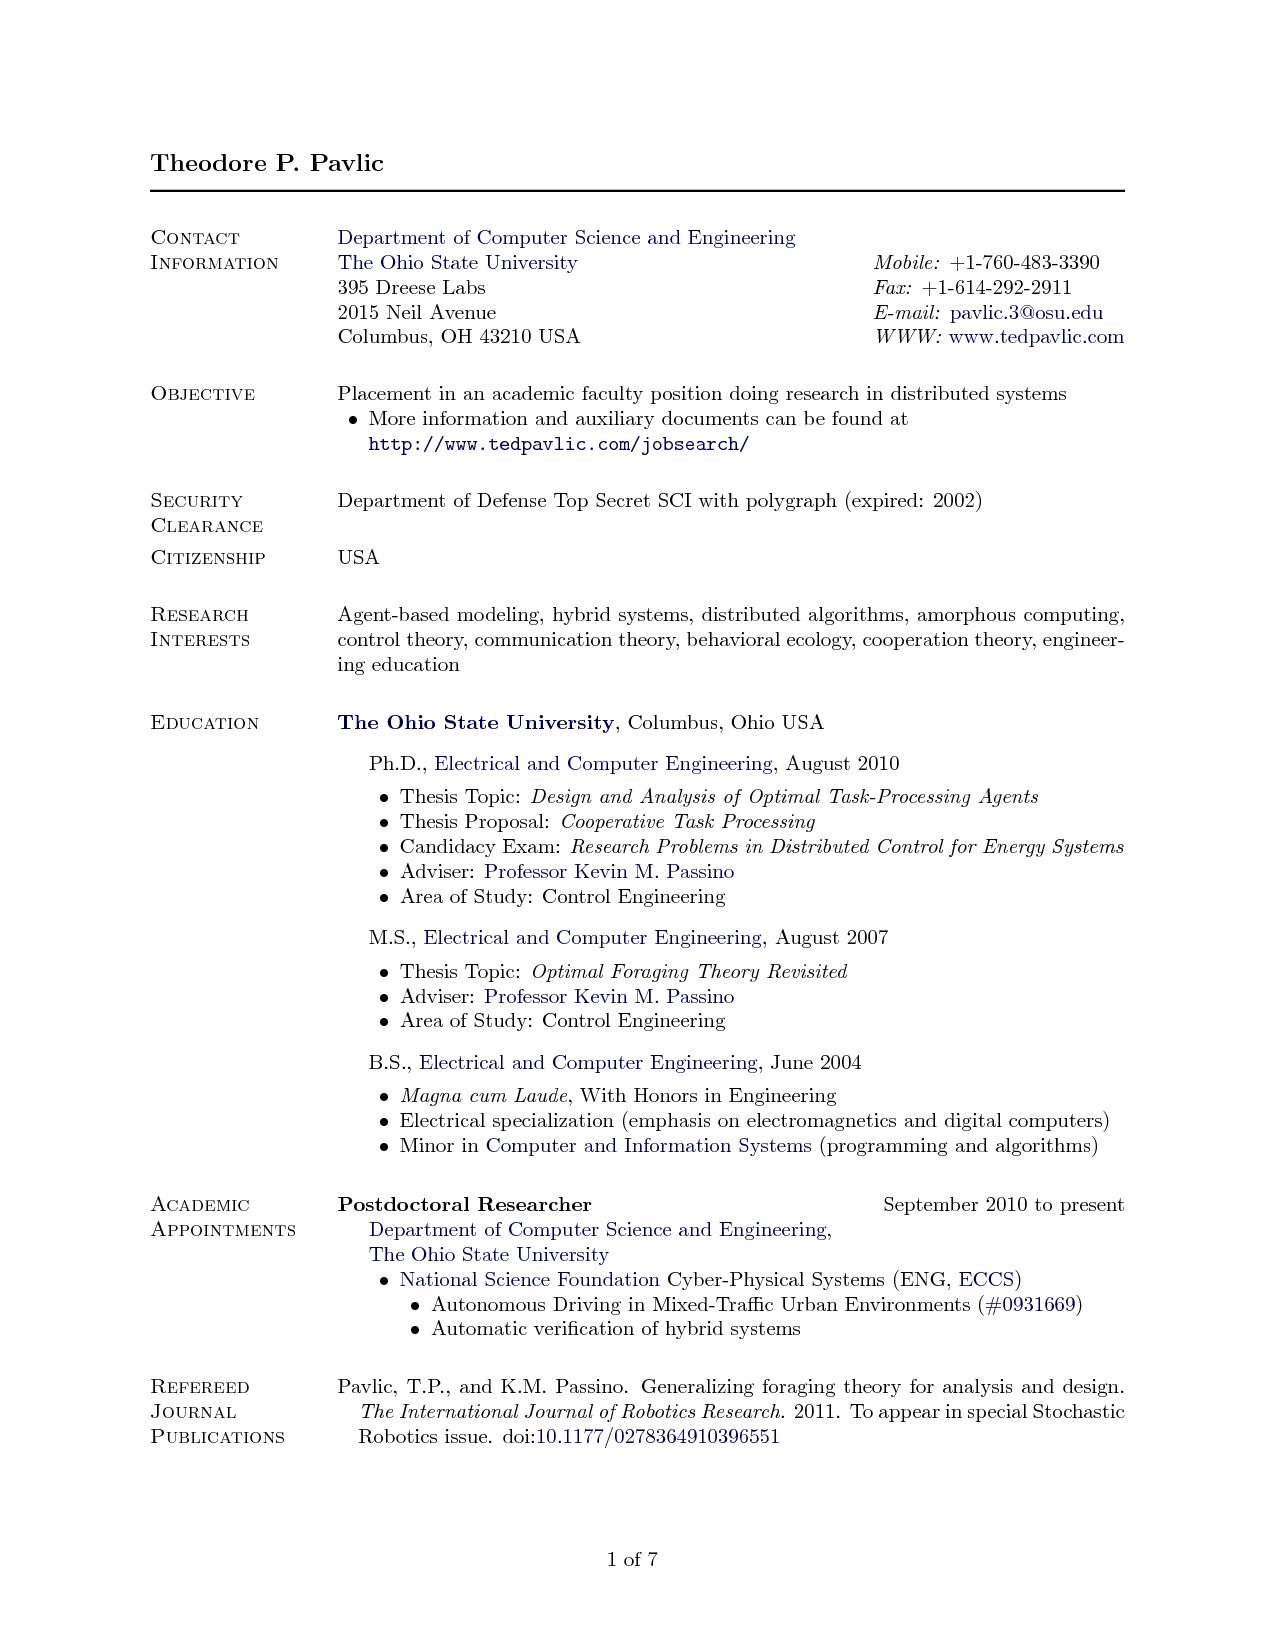 cv template academic science